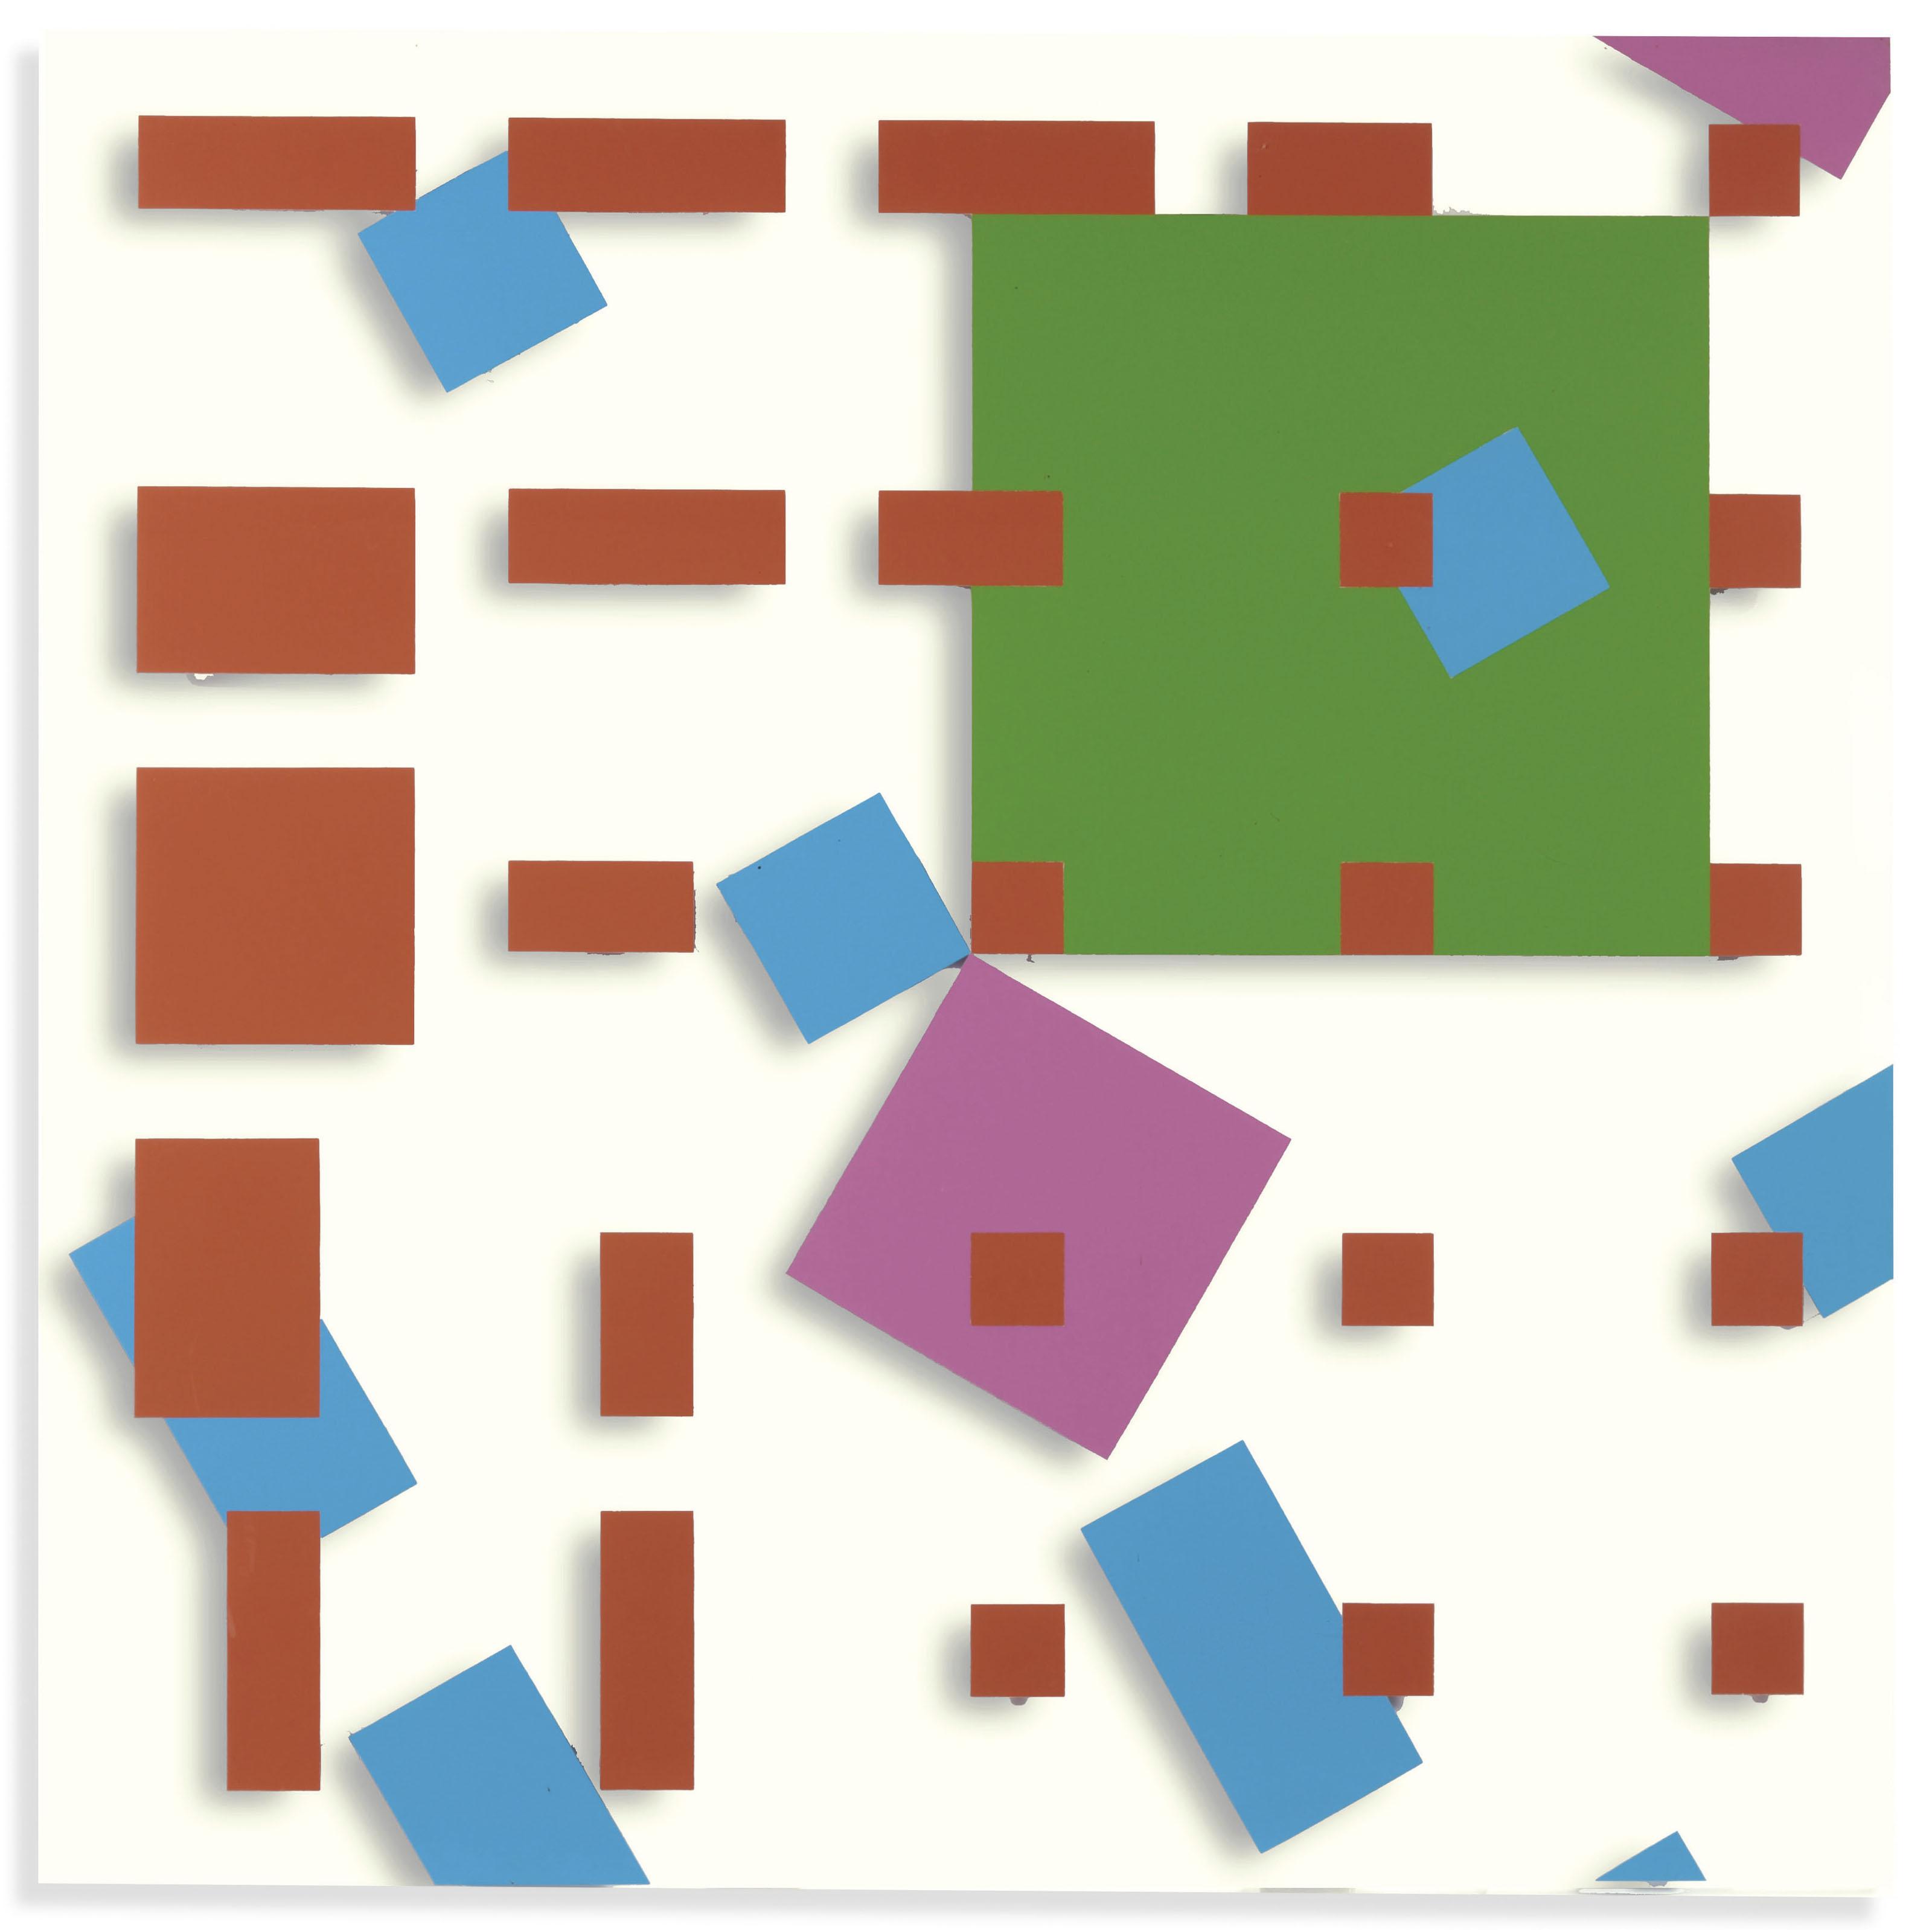 Structuur XVII (Structure XVII)